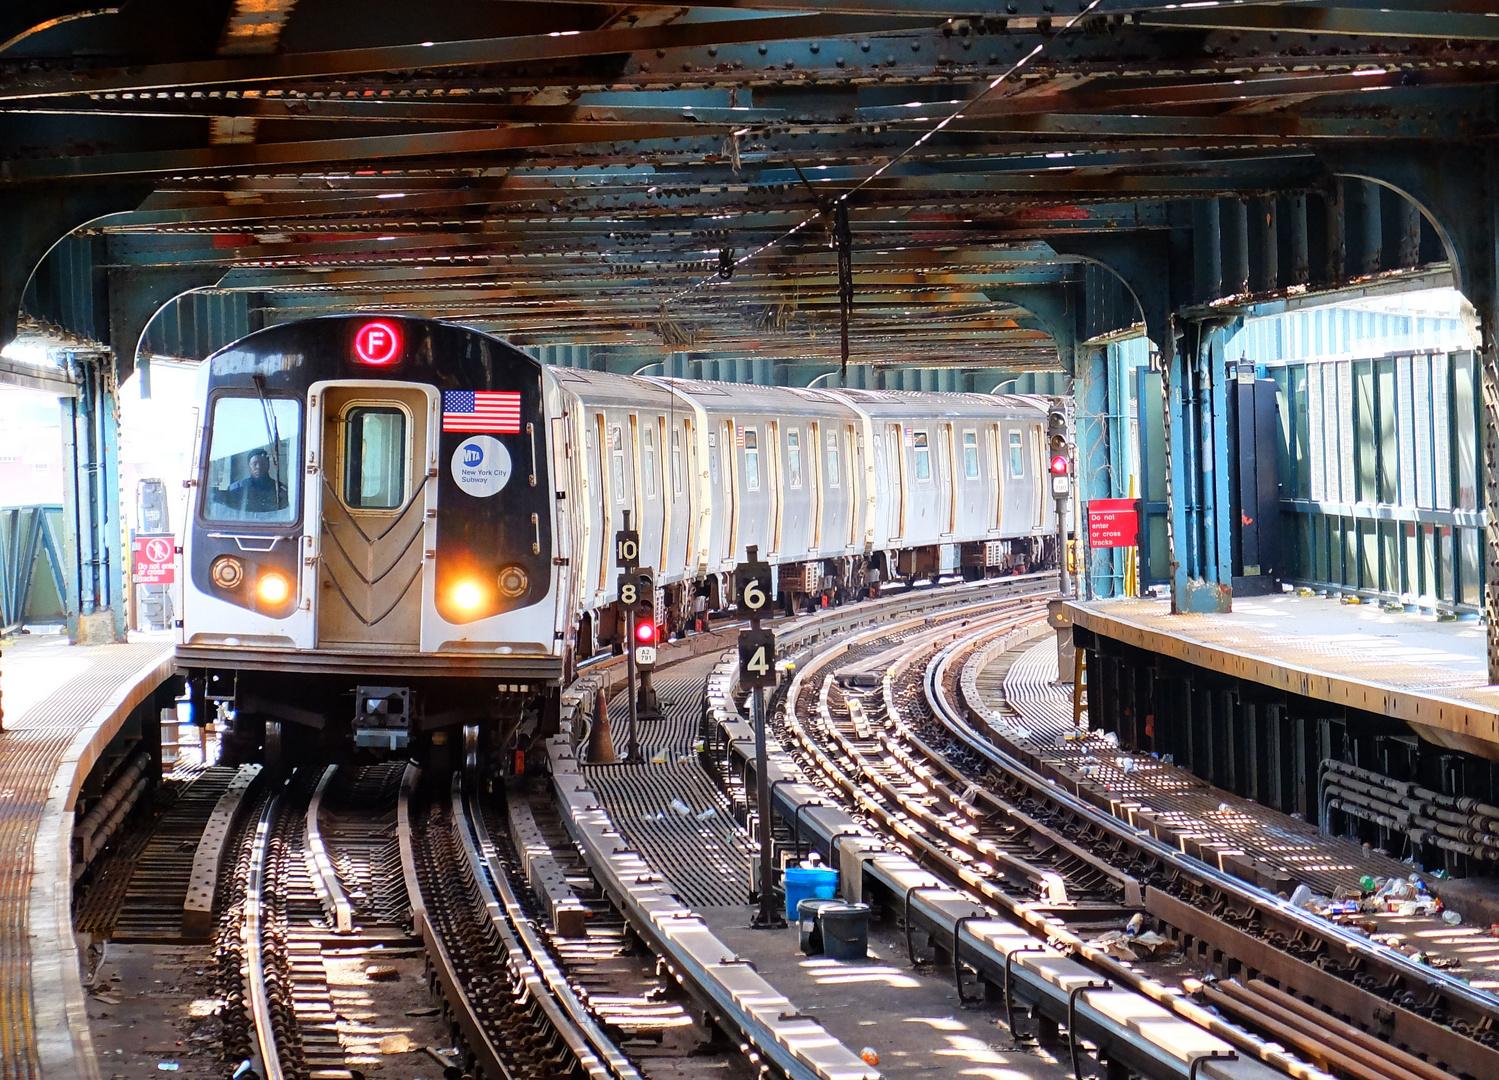 F-Train (NYC West 8 St)